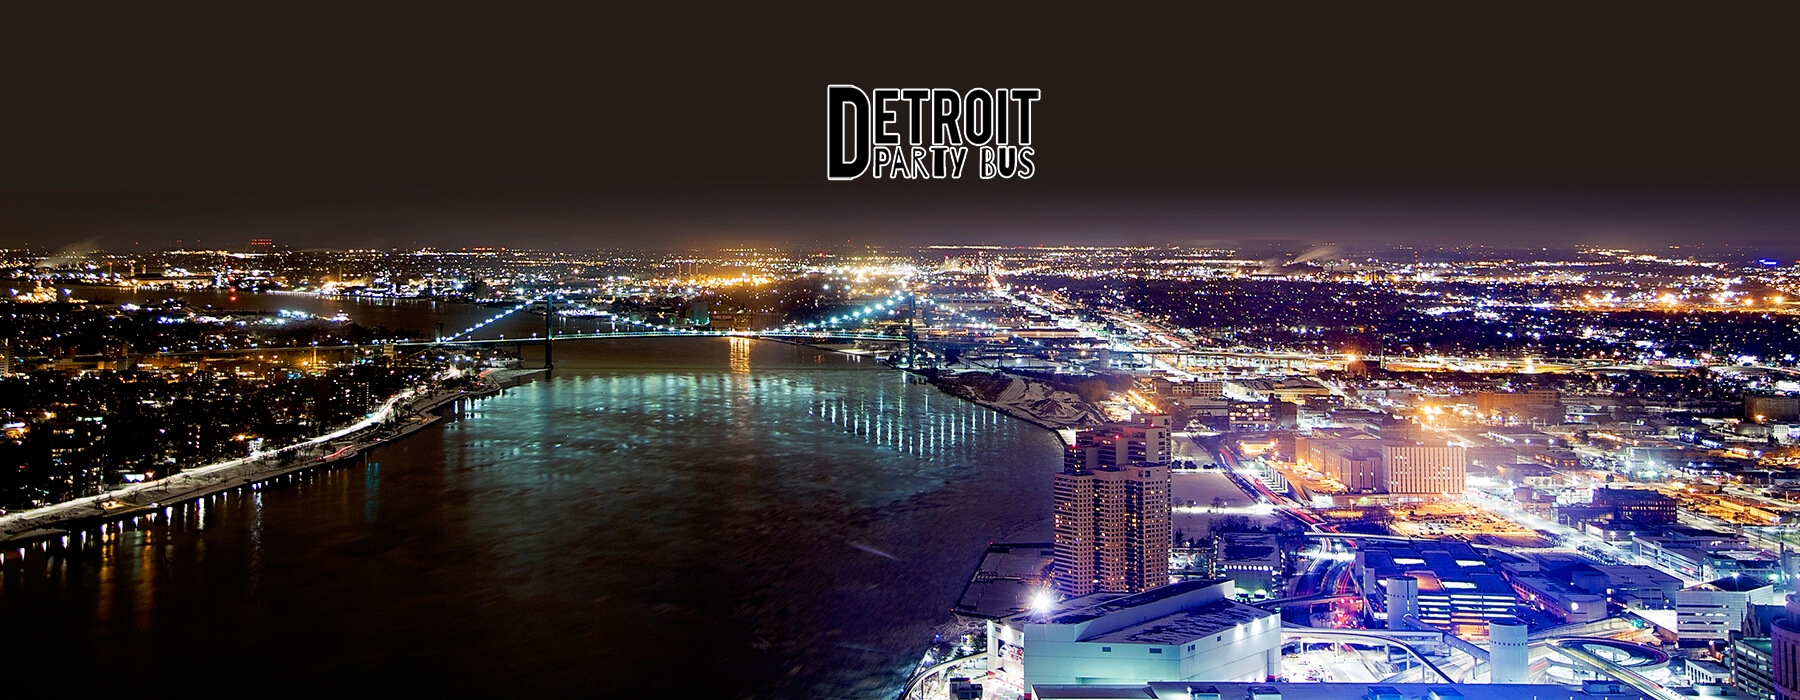 Detroit Party Bus Rentals (@detroitpartybus) Cover Image